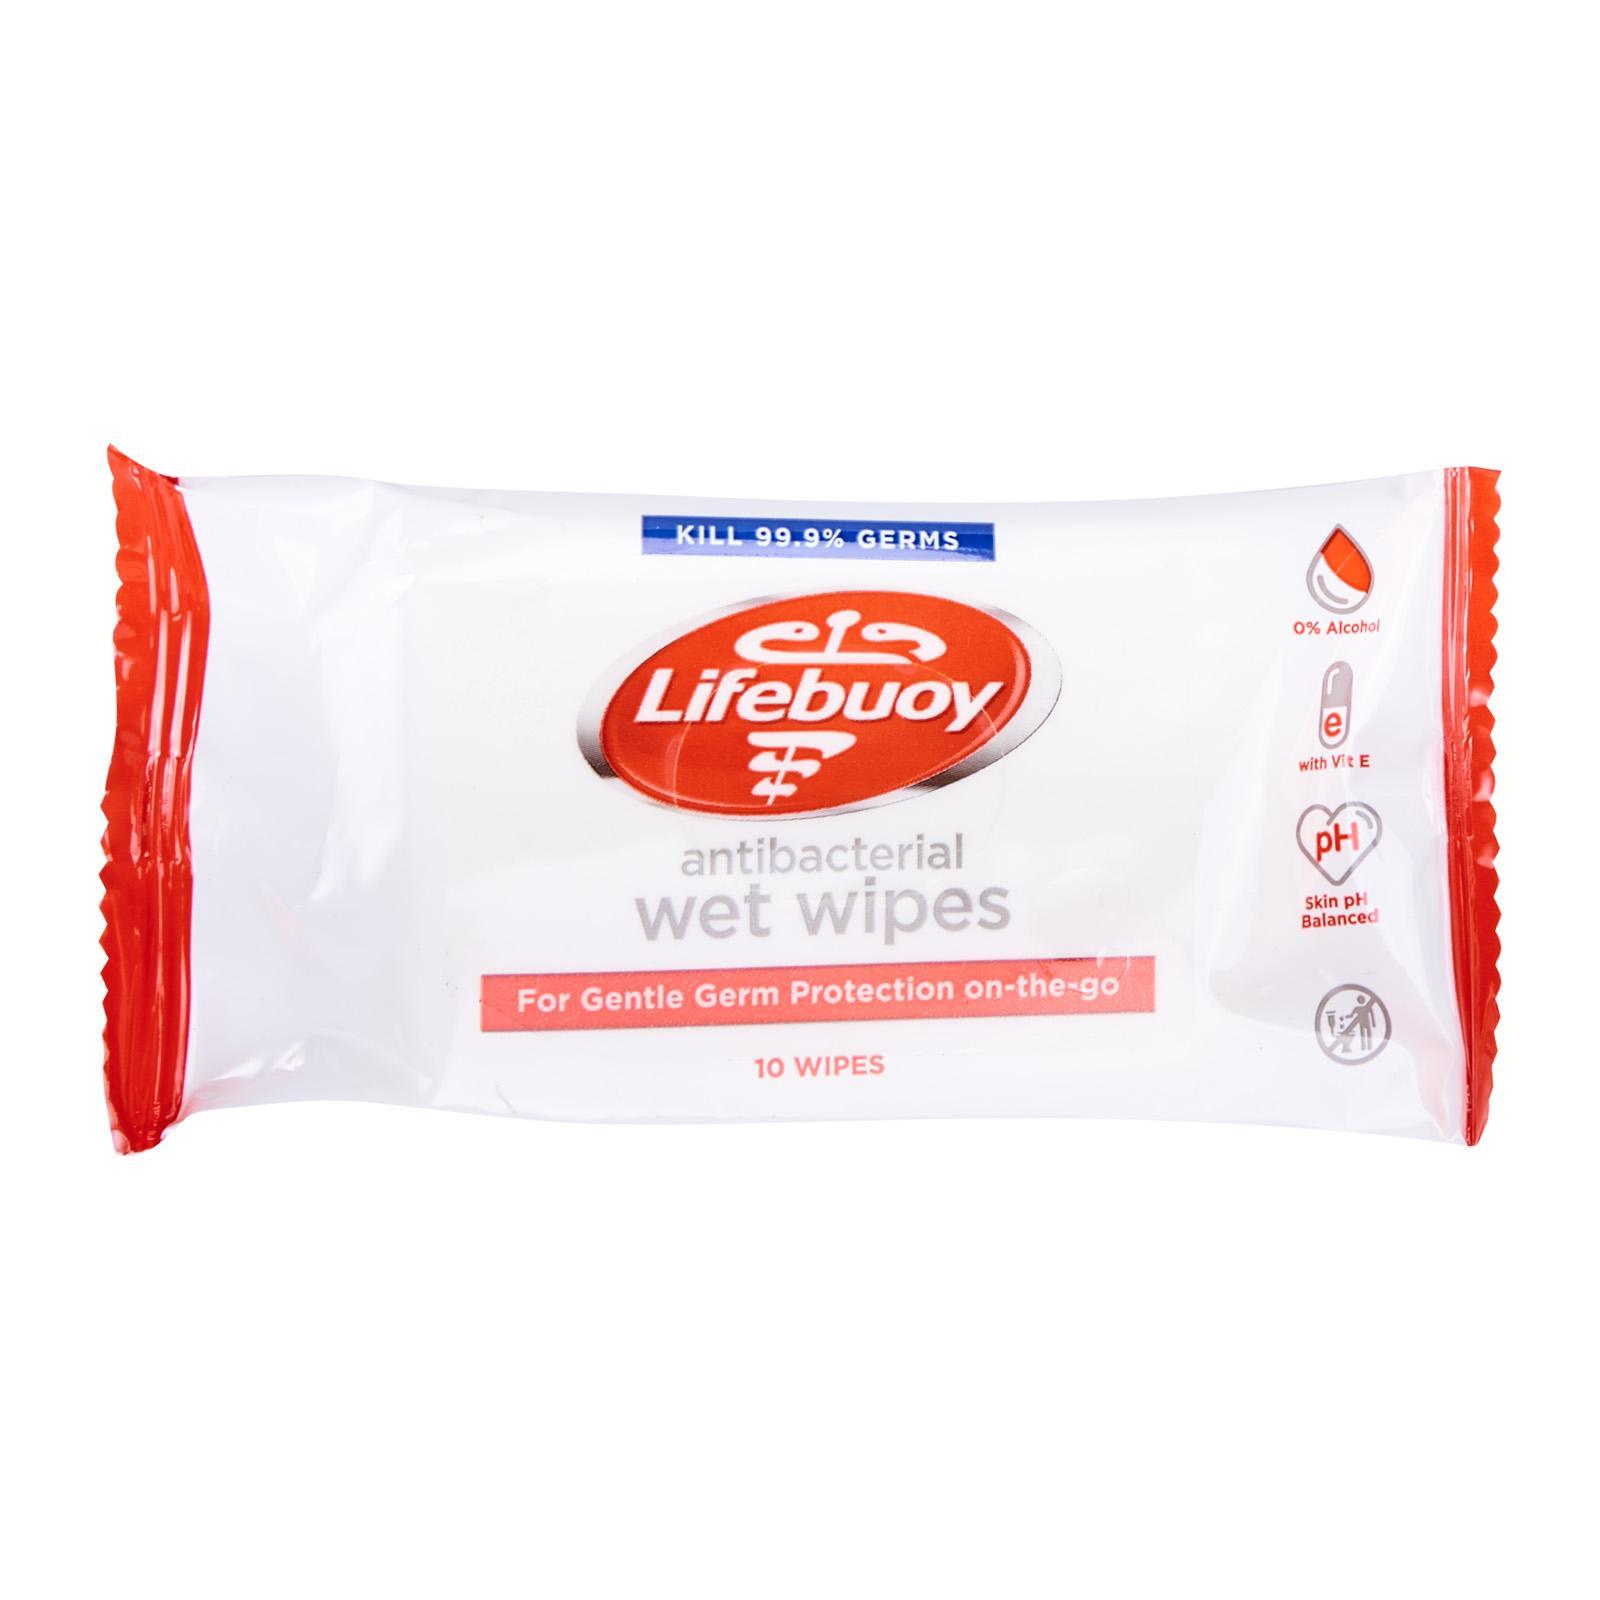 Lifebuoy Antibacterial Wet Wipes 48 count